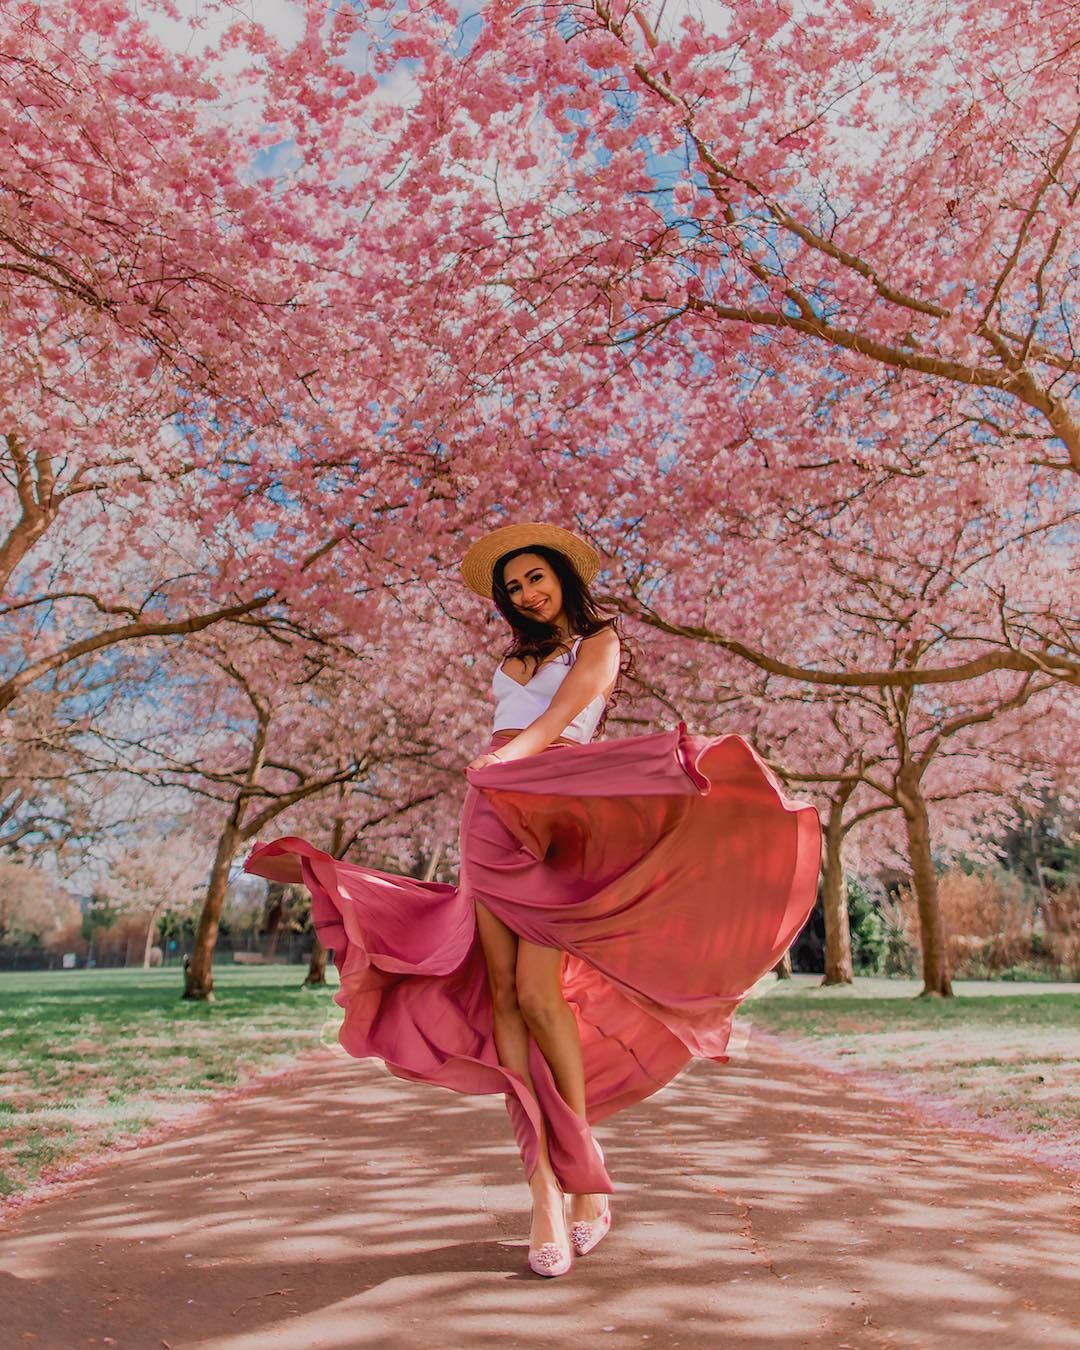 Spring Cherry Blossom Tree Inspired Dress By Ursulaillustration Fashion Illustration Sketch Cherry Blossom Dress Fashion Illustration Clothing Themes